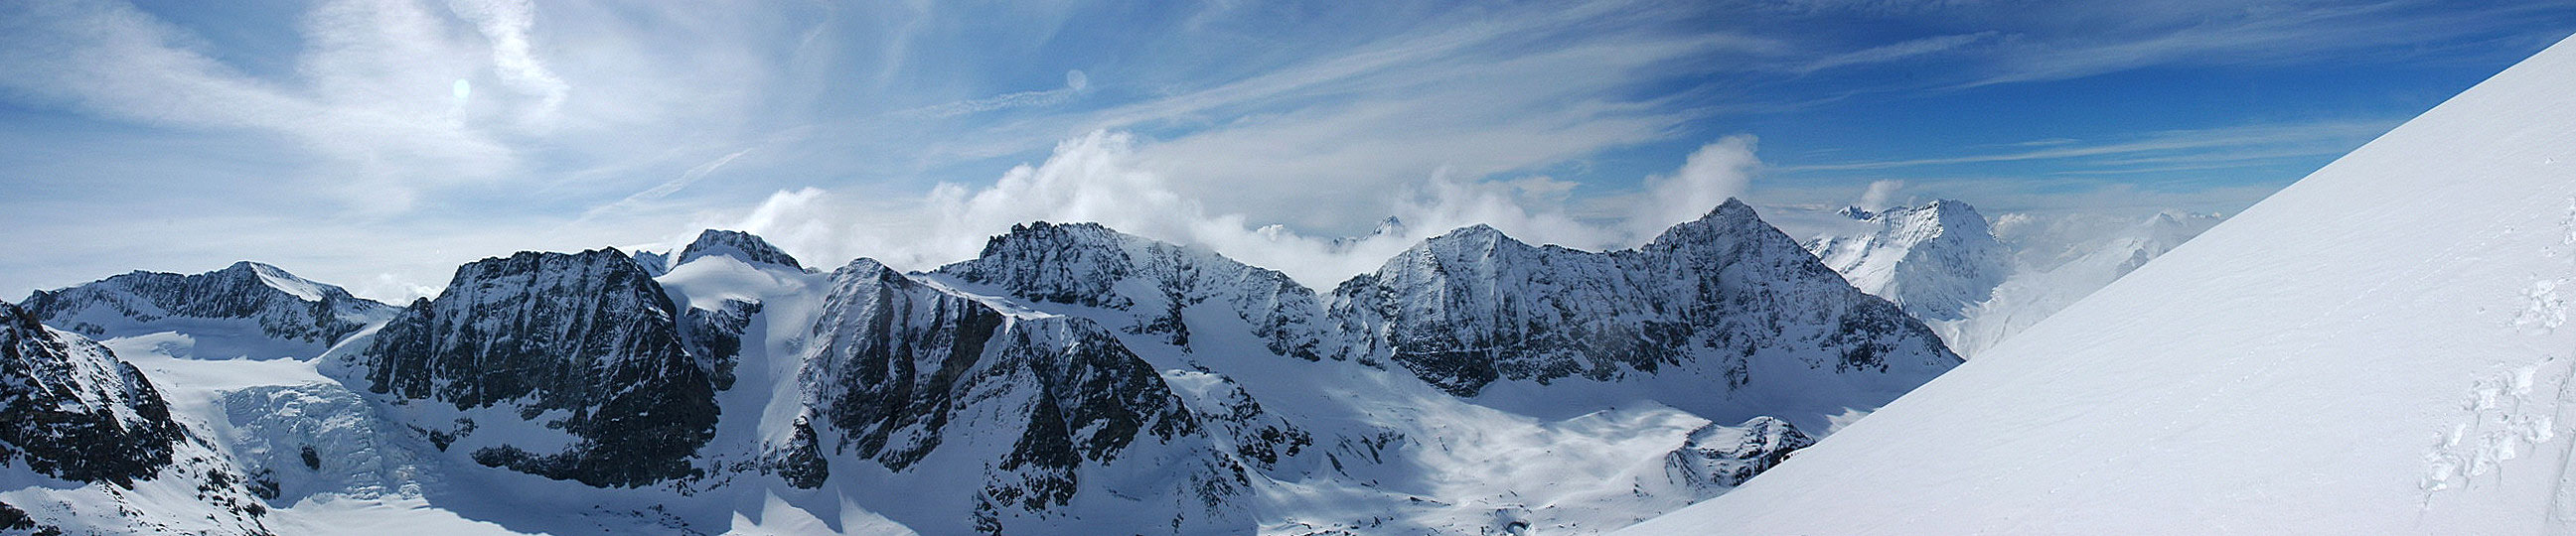 La Ruinette Walliser Alpen / Alpes valaisannes Švýcarsko panorama 17